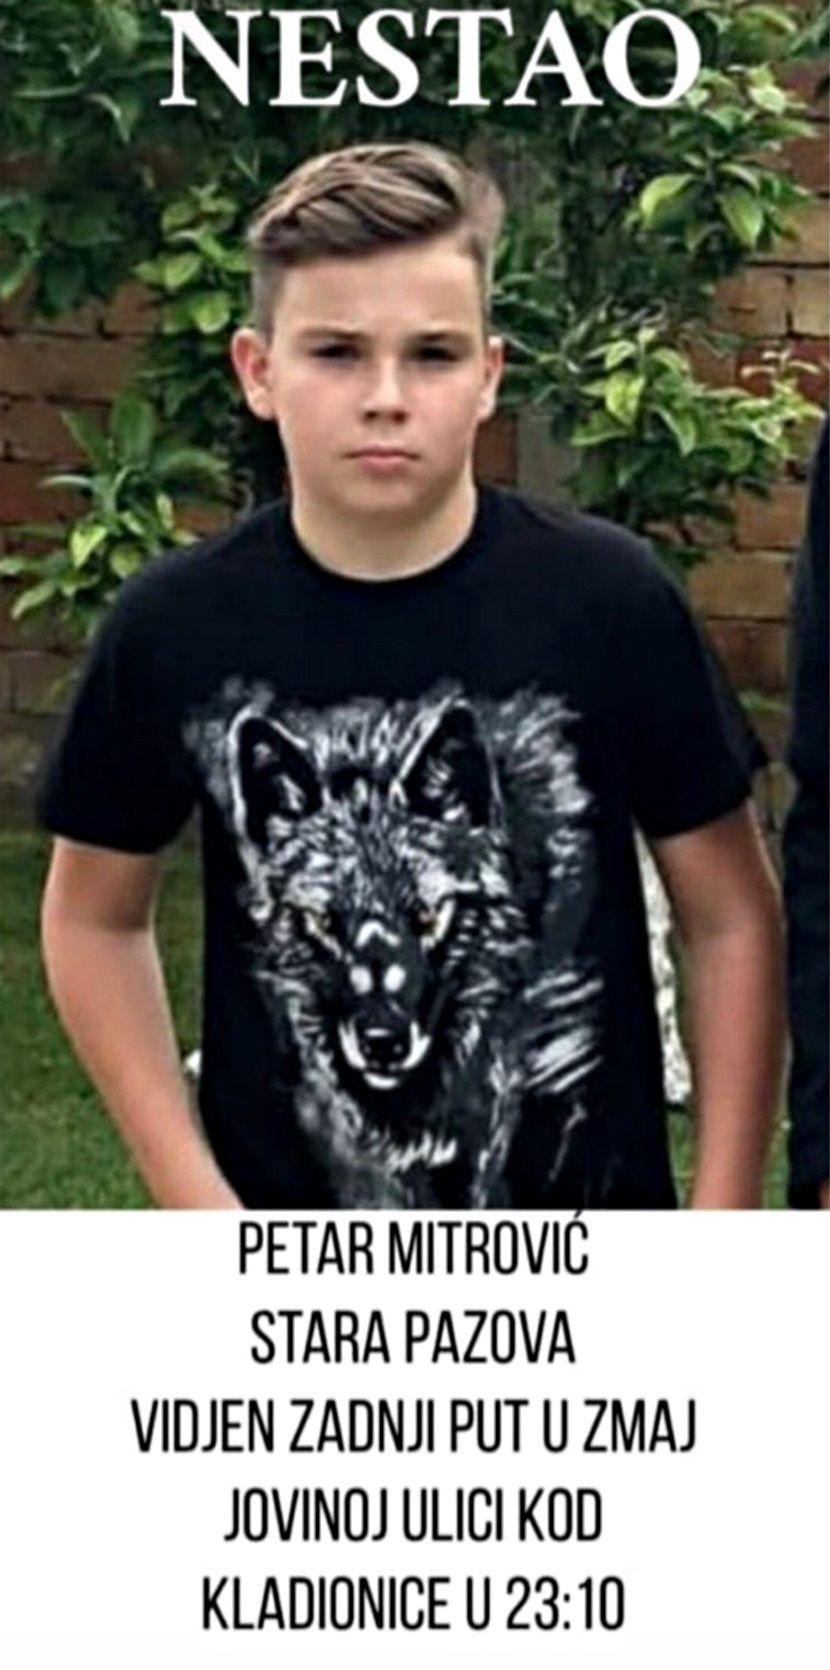 Nestao, Petar Mitrović